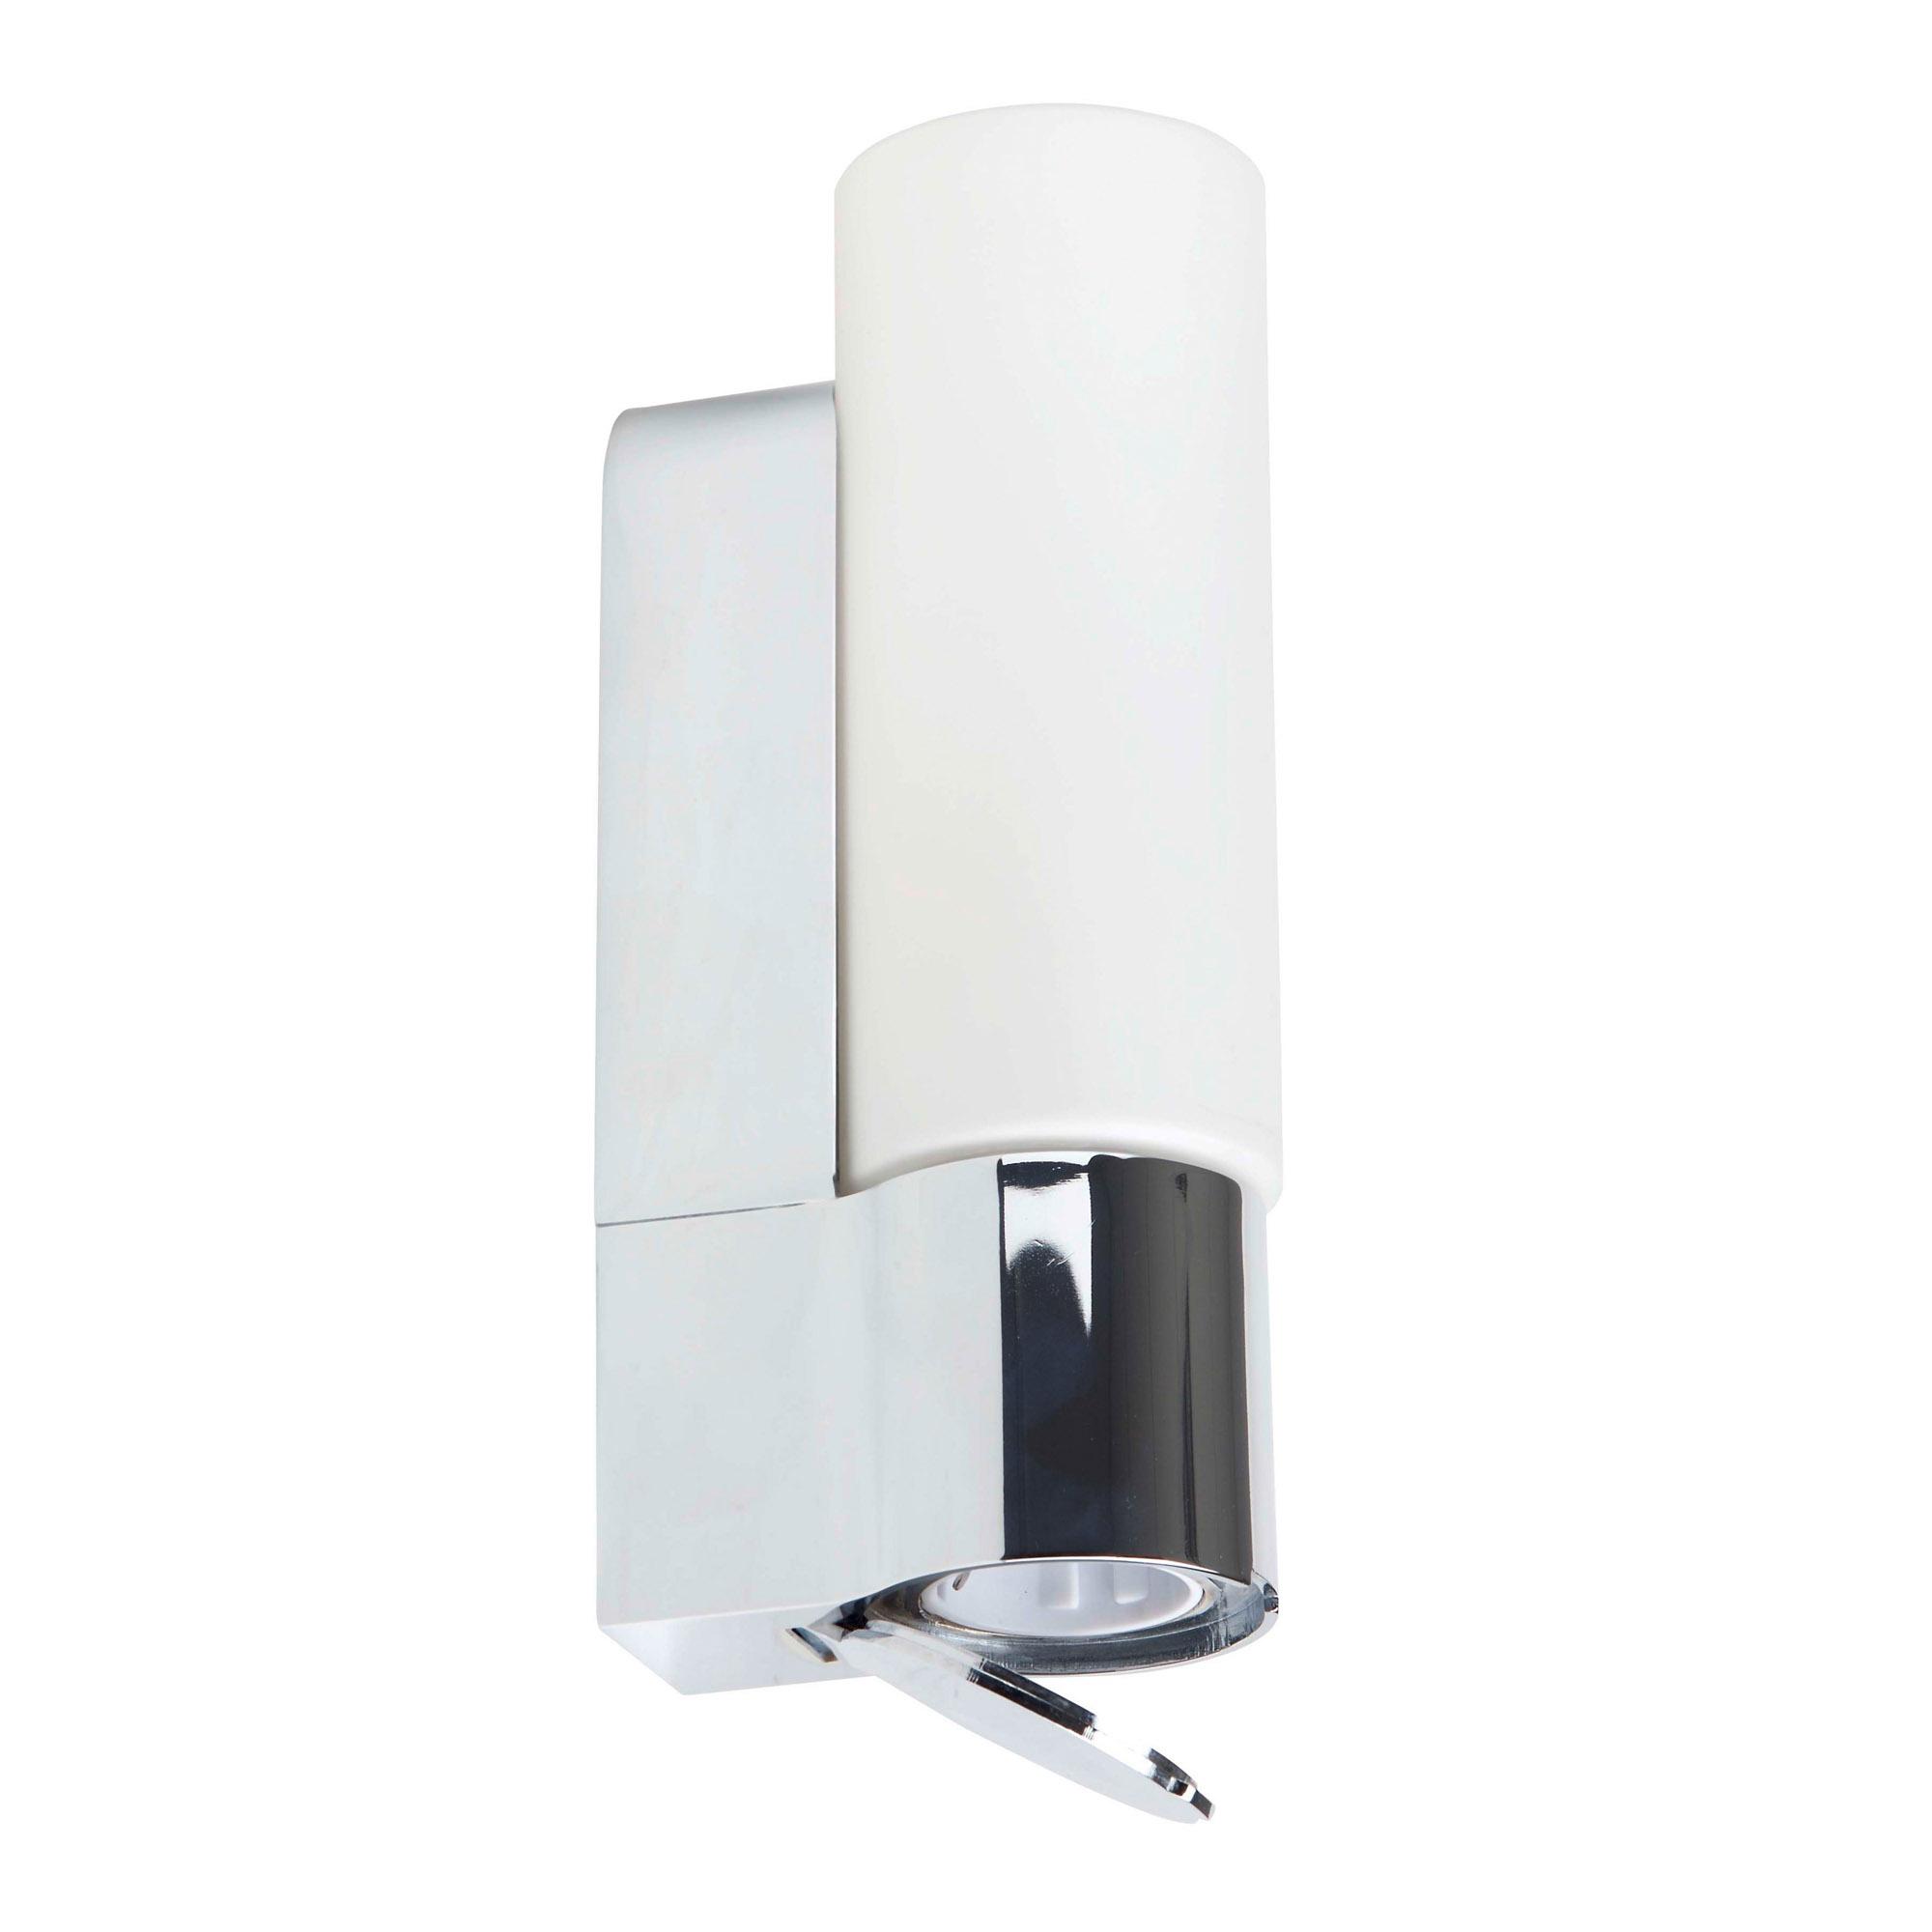 Badezimmer Wandleuchte mit integrierter Steckdose, IP16, E16 max. 16W,  Metall / Glas, chrom